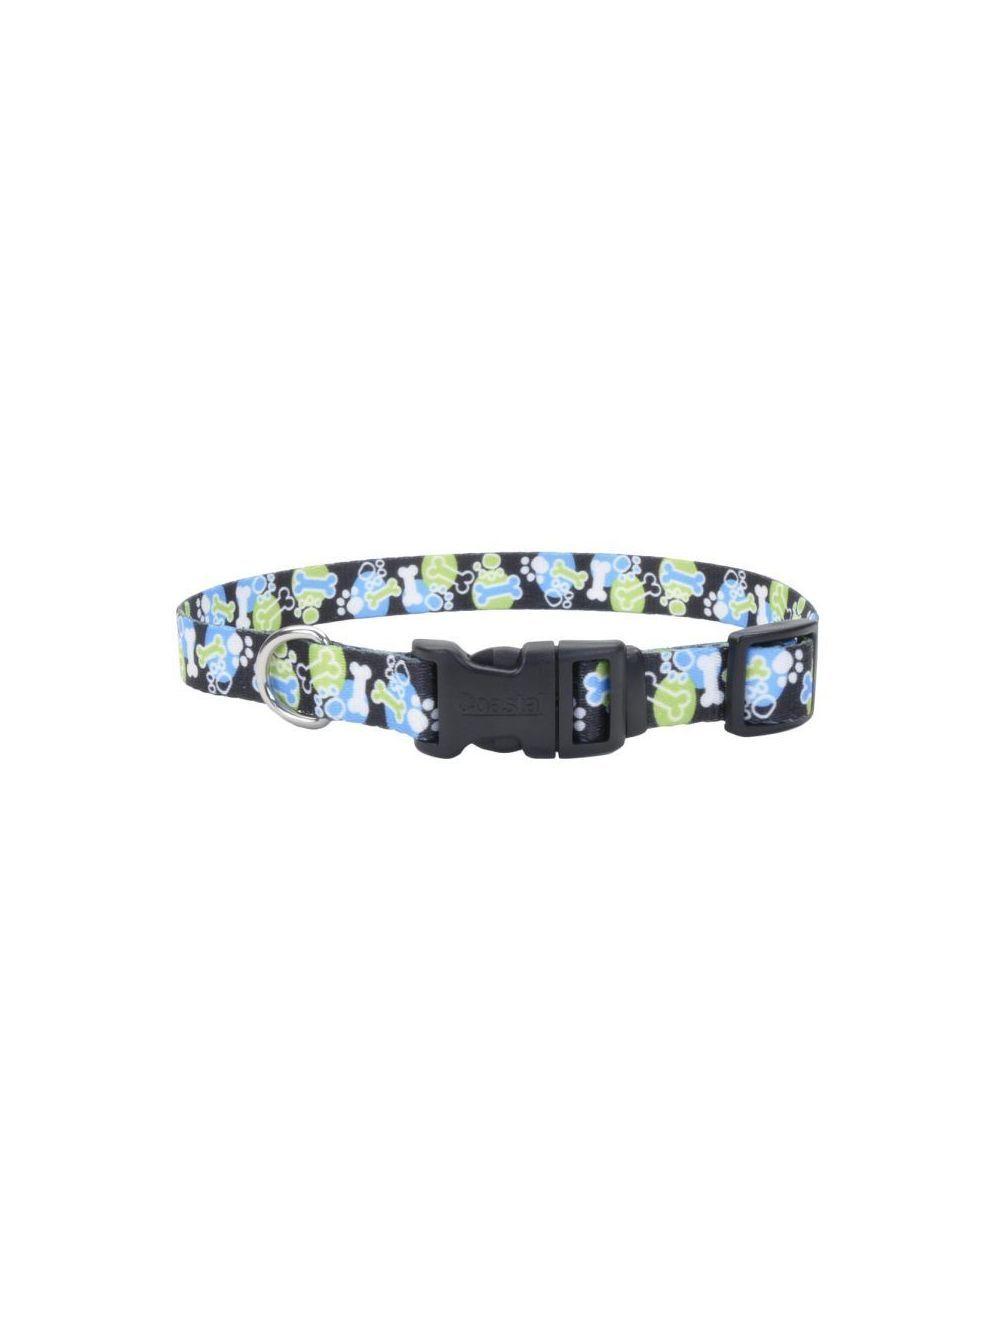 Coastal perro styles hueso huella azul collar small 5/8